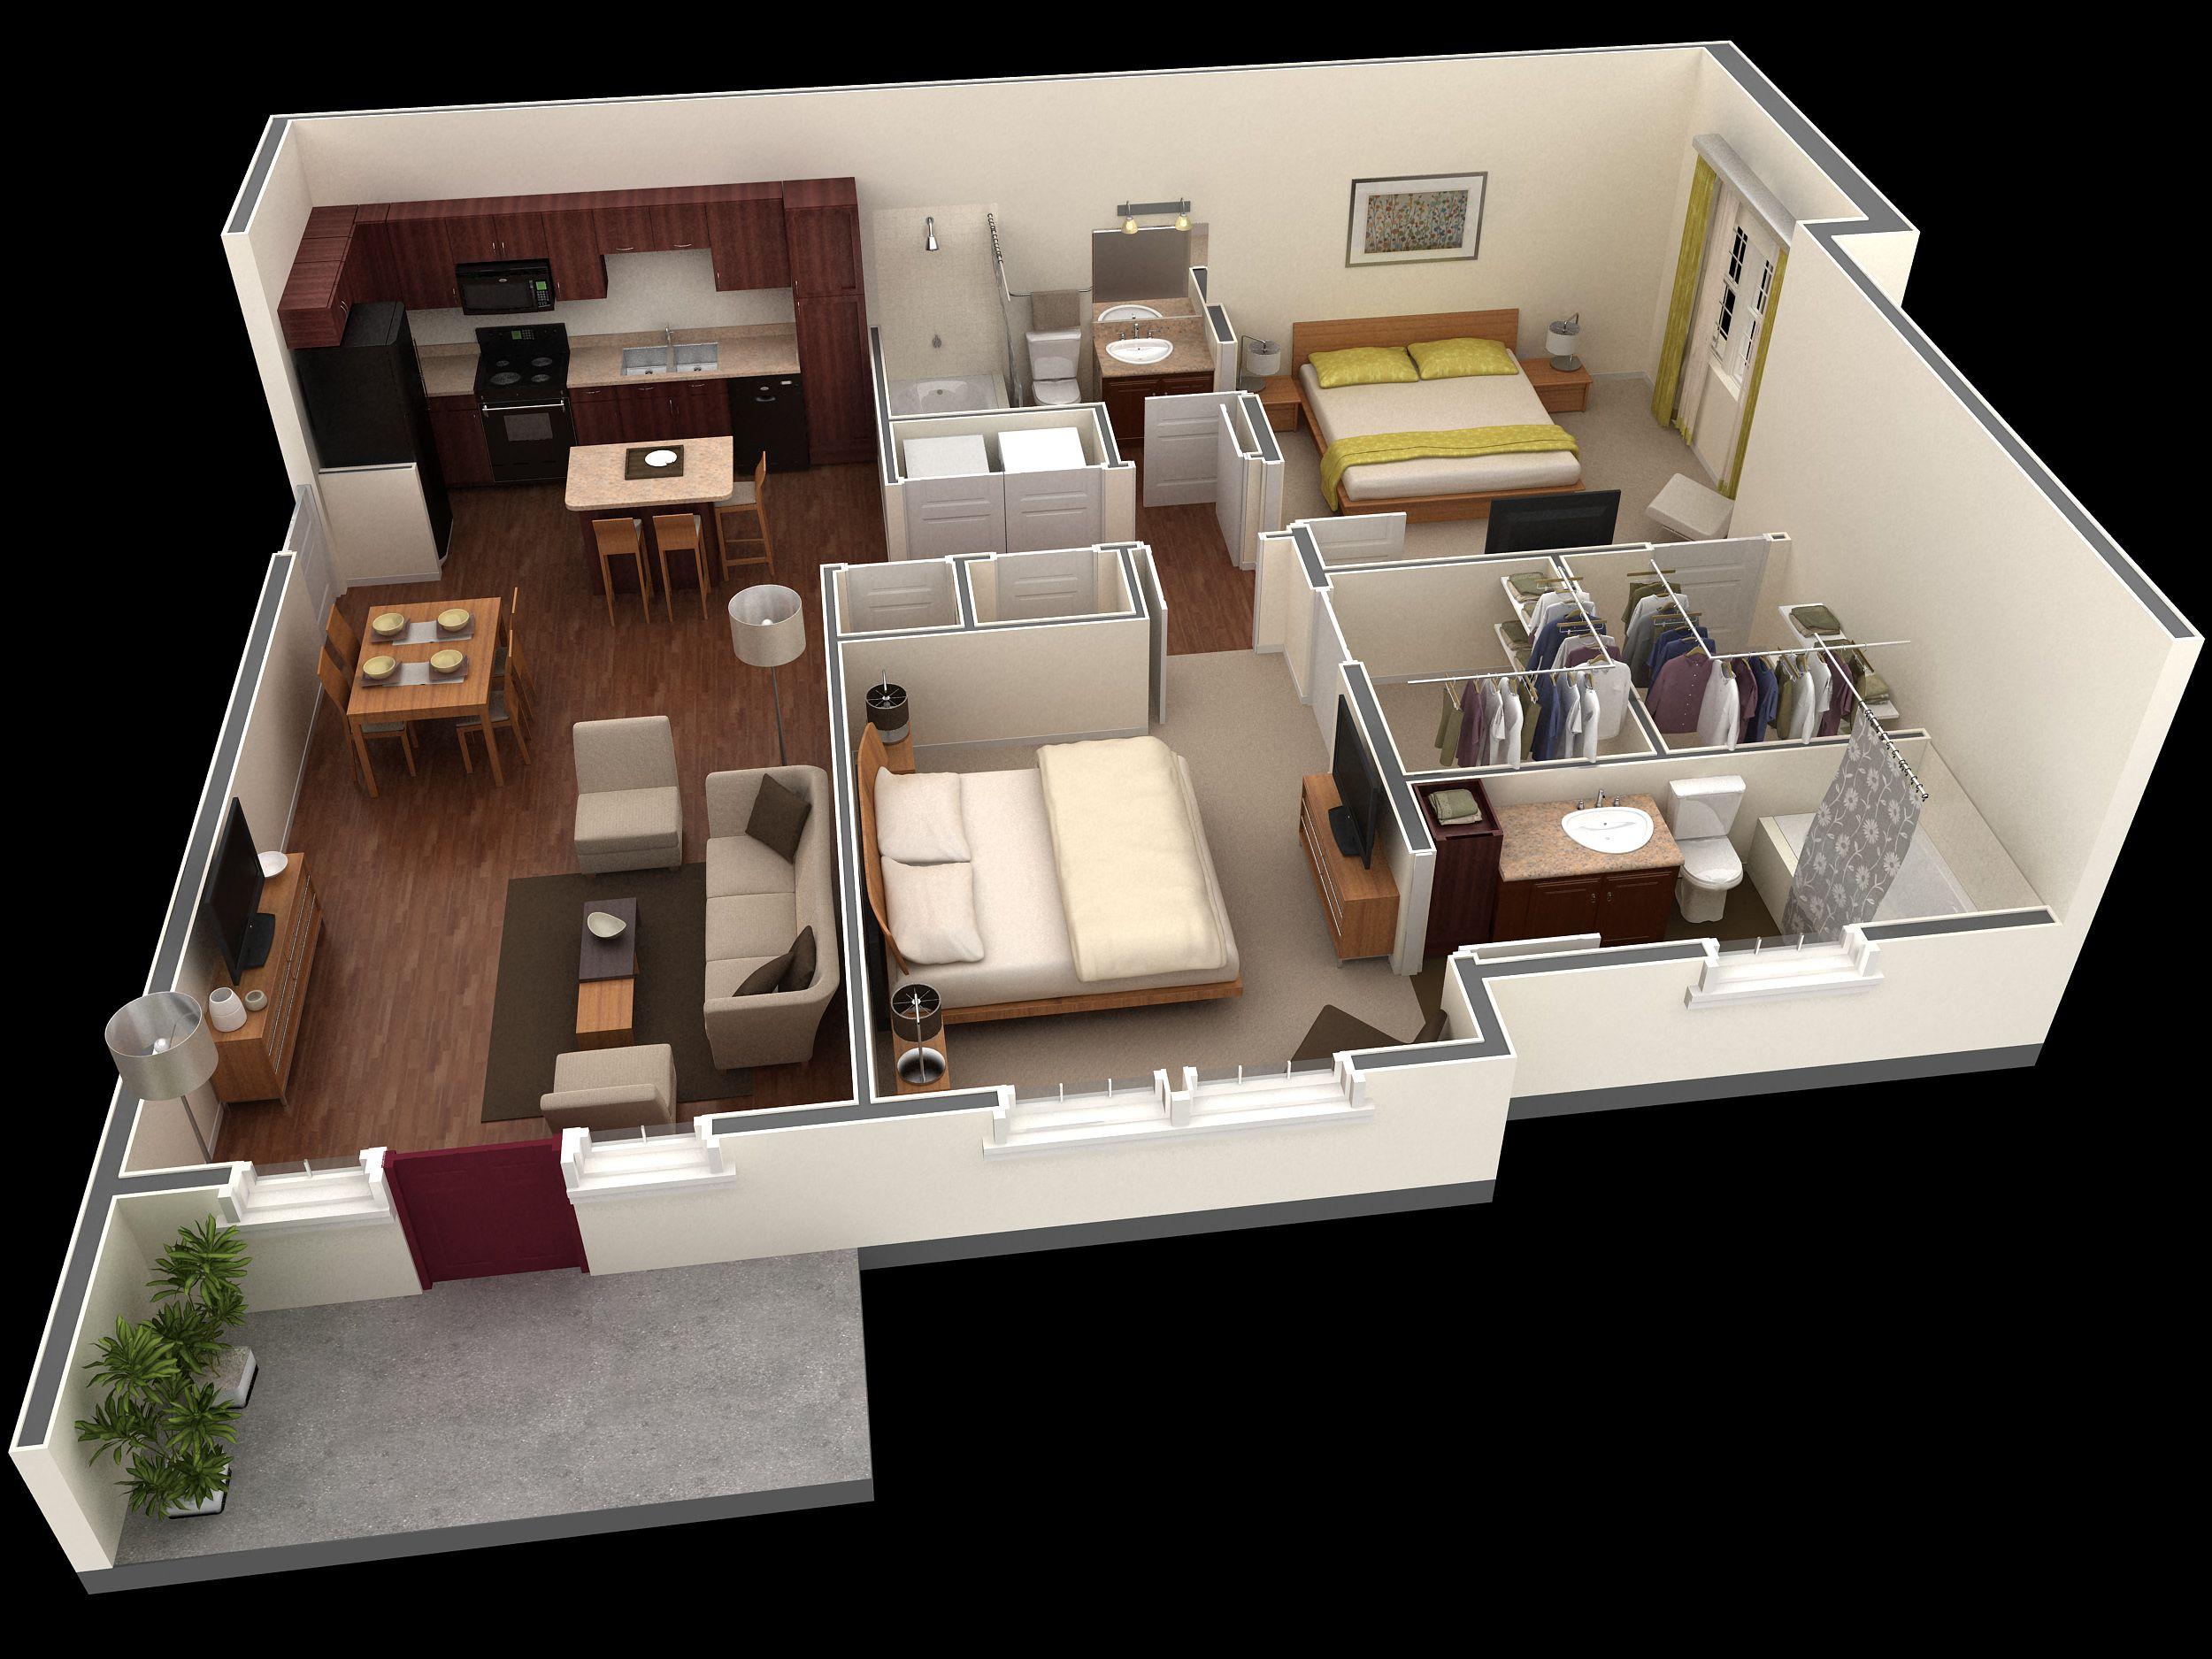 2 Bedroom 2 Bath 1125 Sf Apartment At Springs At Legacy